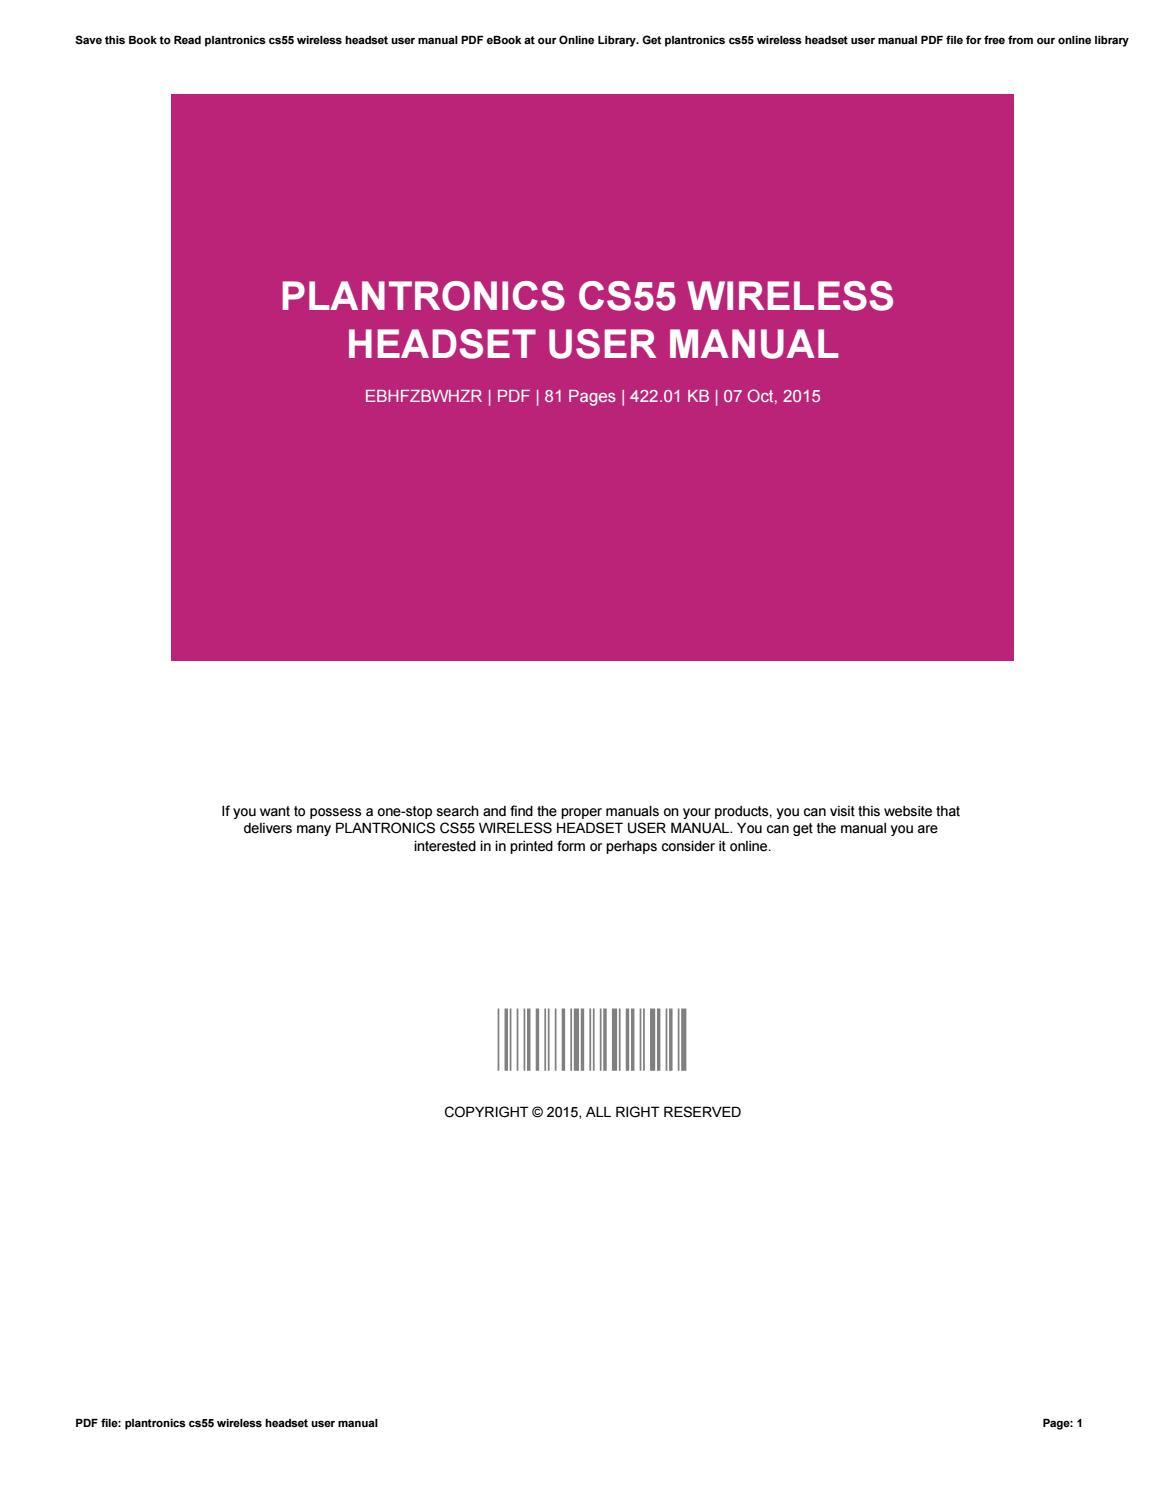 Plantronics c50 manual.